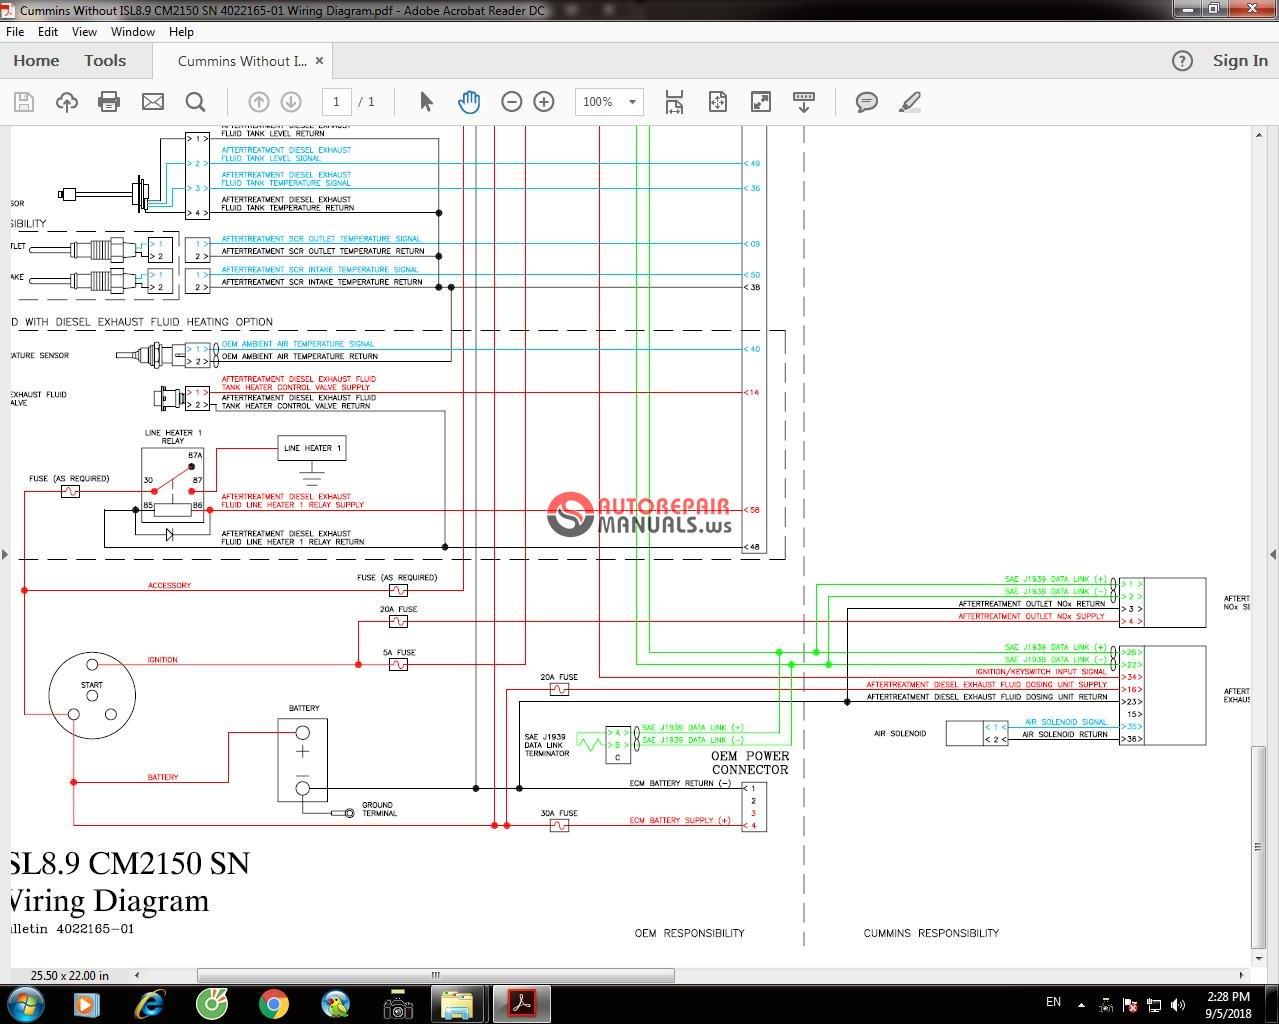 cummins without isl8 9 cm2150 sn 4022165 01 wiring diagram. Black Bedroom Furniture Sets. Home Design Ideas